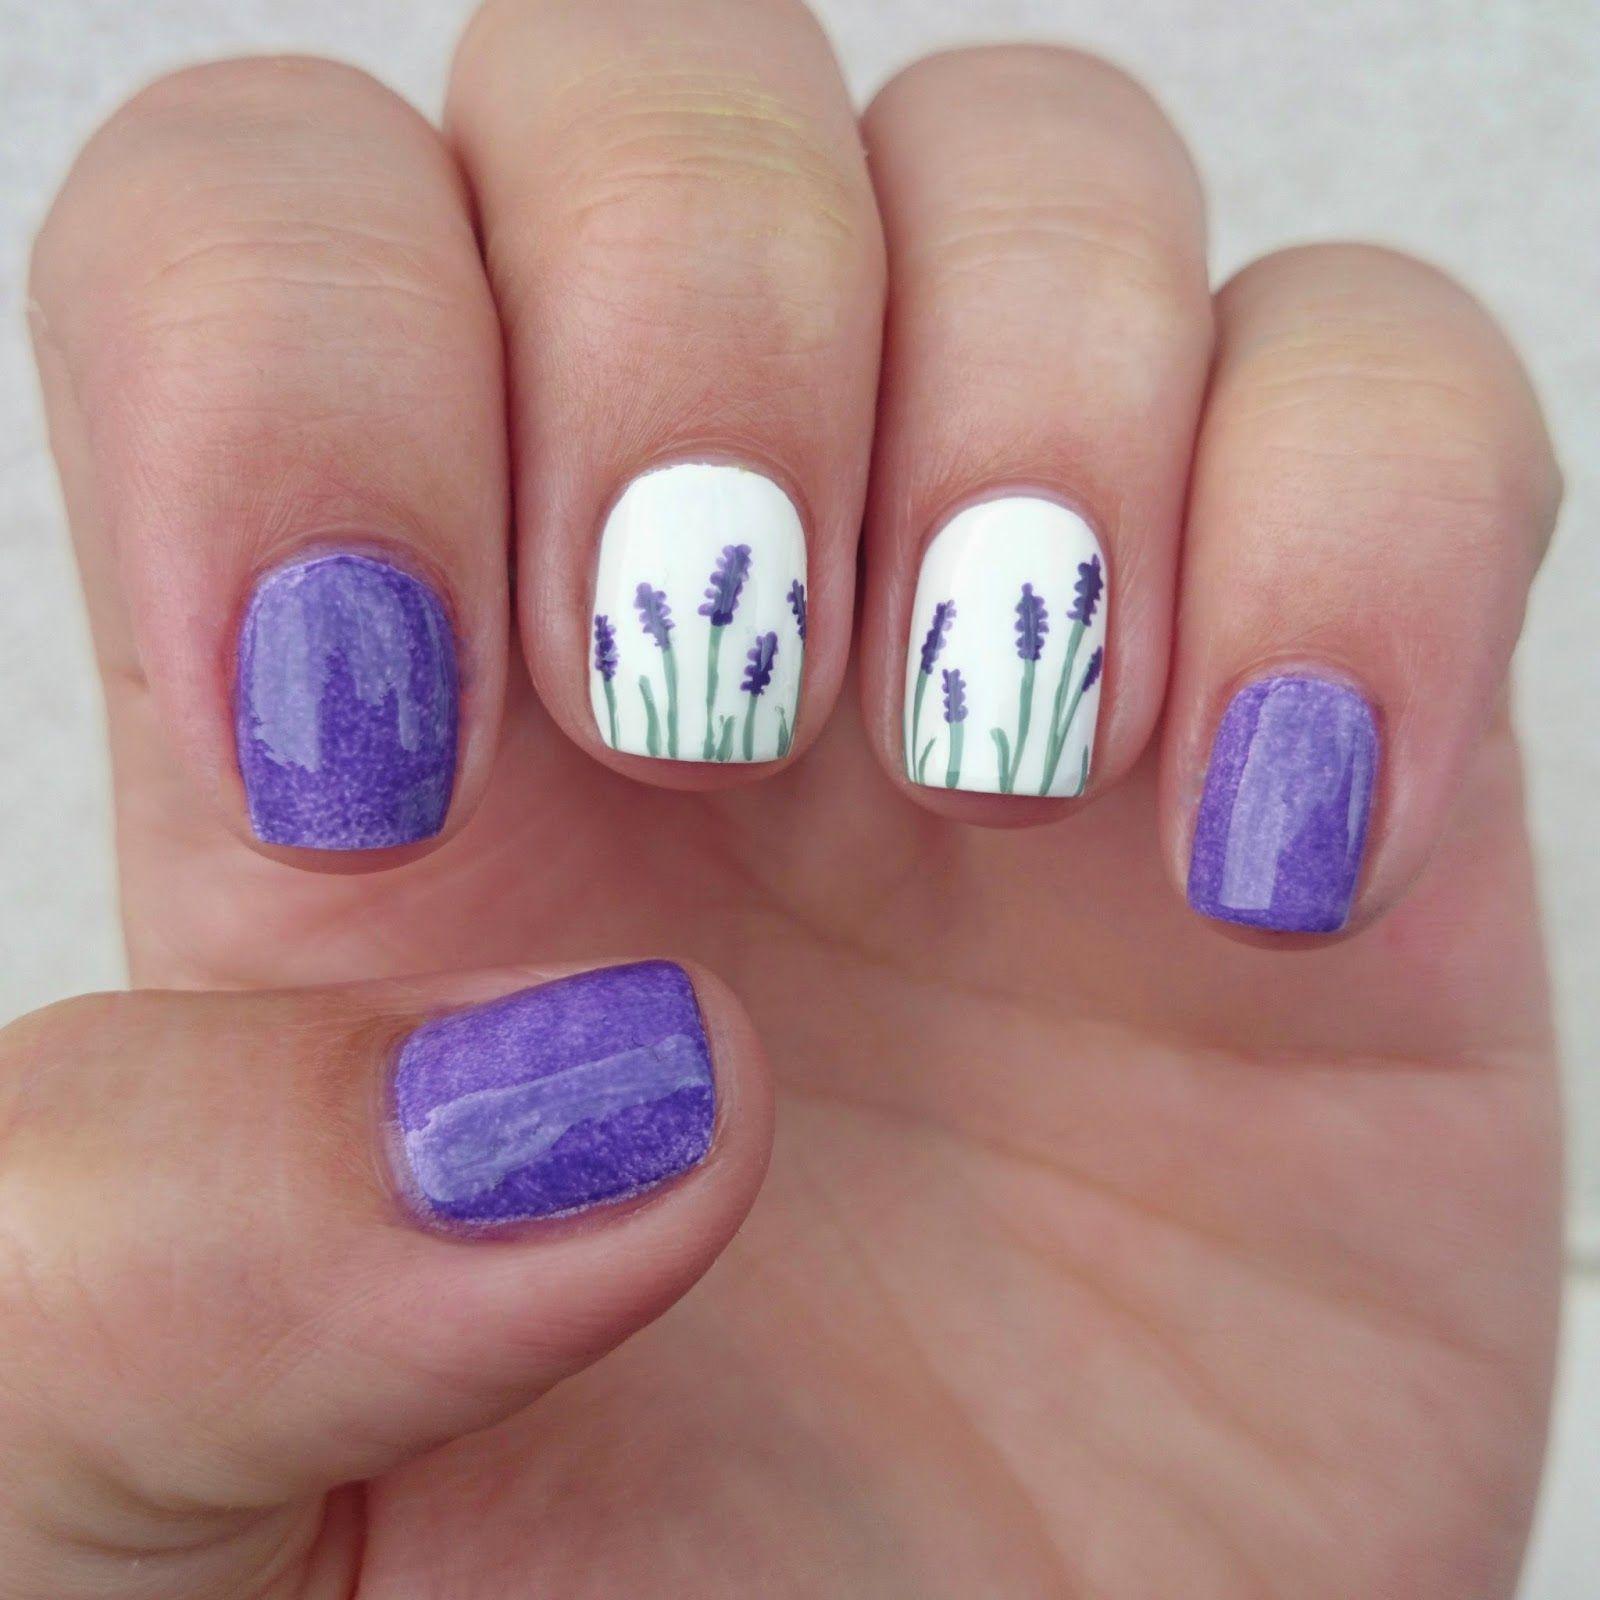 Dahlia Nails Lovely Lavender Lavender Nails Flower Nails Trendy Nails